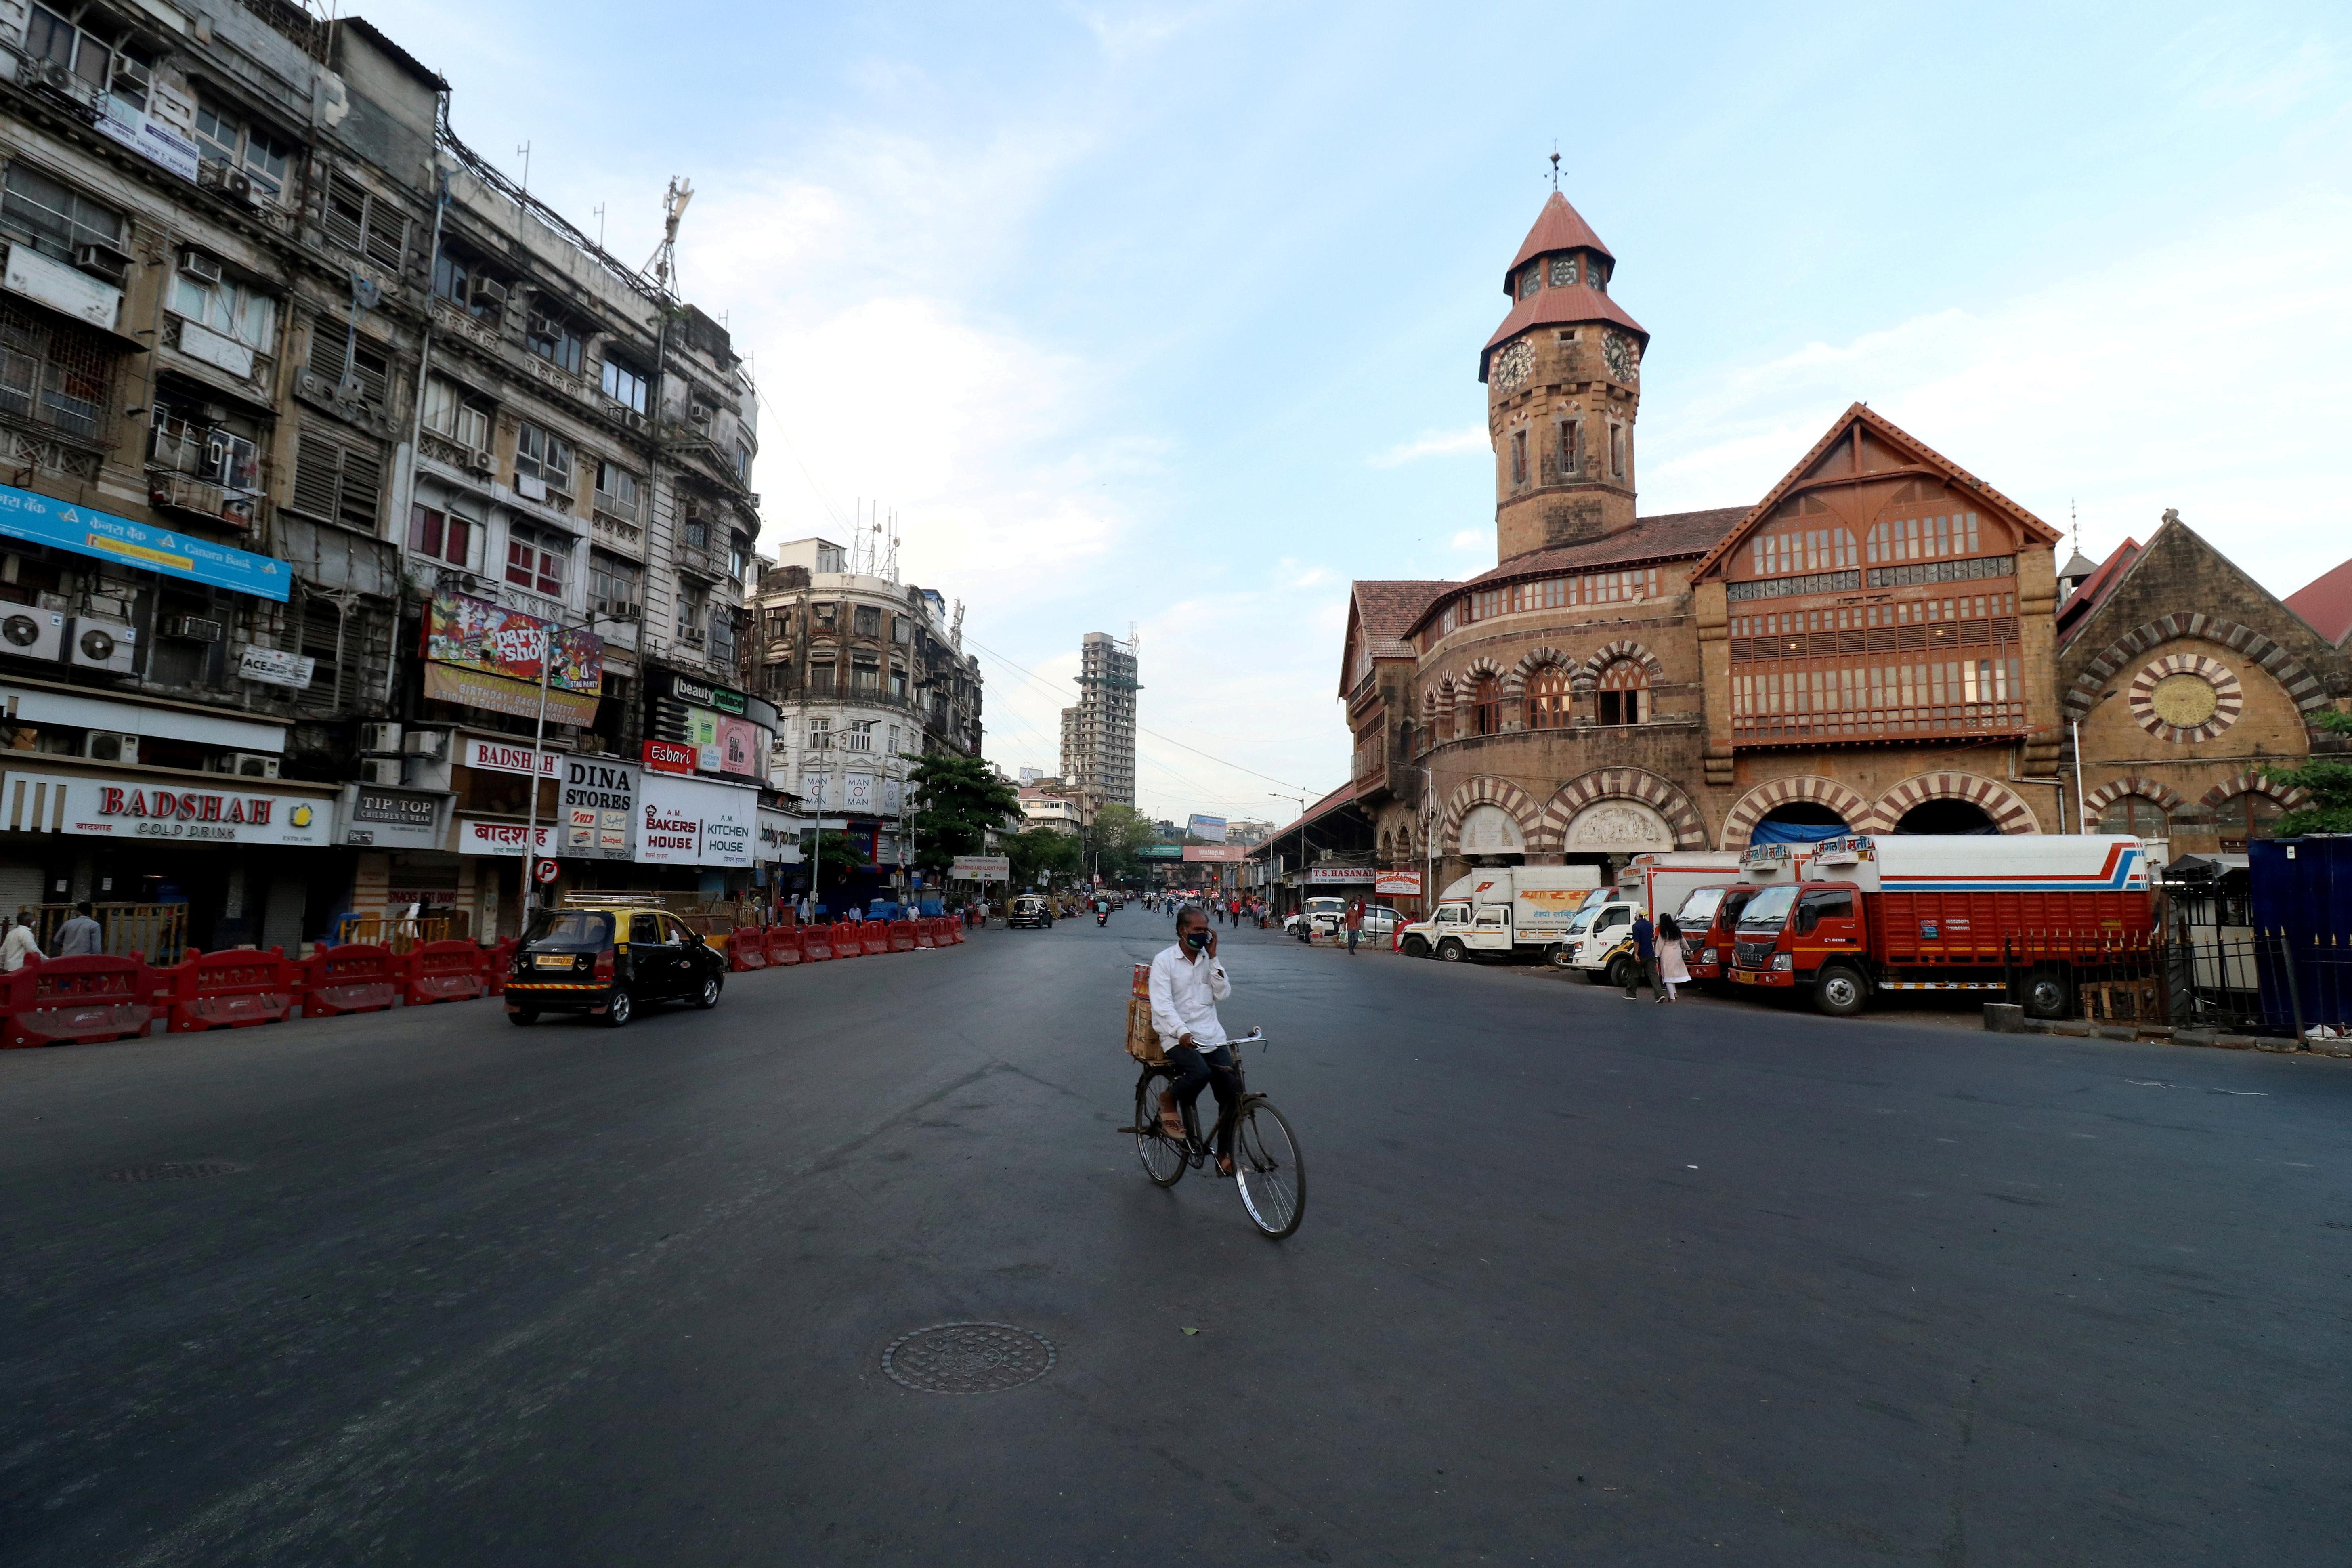 A man rides his bicycle during a lockdown to limit the spread of the coronavirus disease (COVID-19) in Mumbai, India, April 23, 2021. REUTERS/Niharika Kulkarni/File Photo